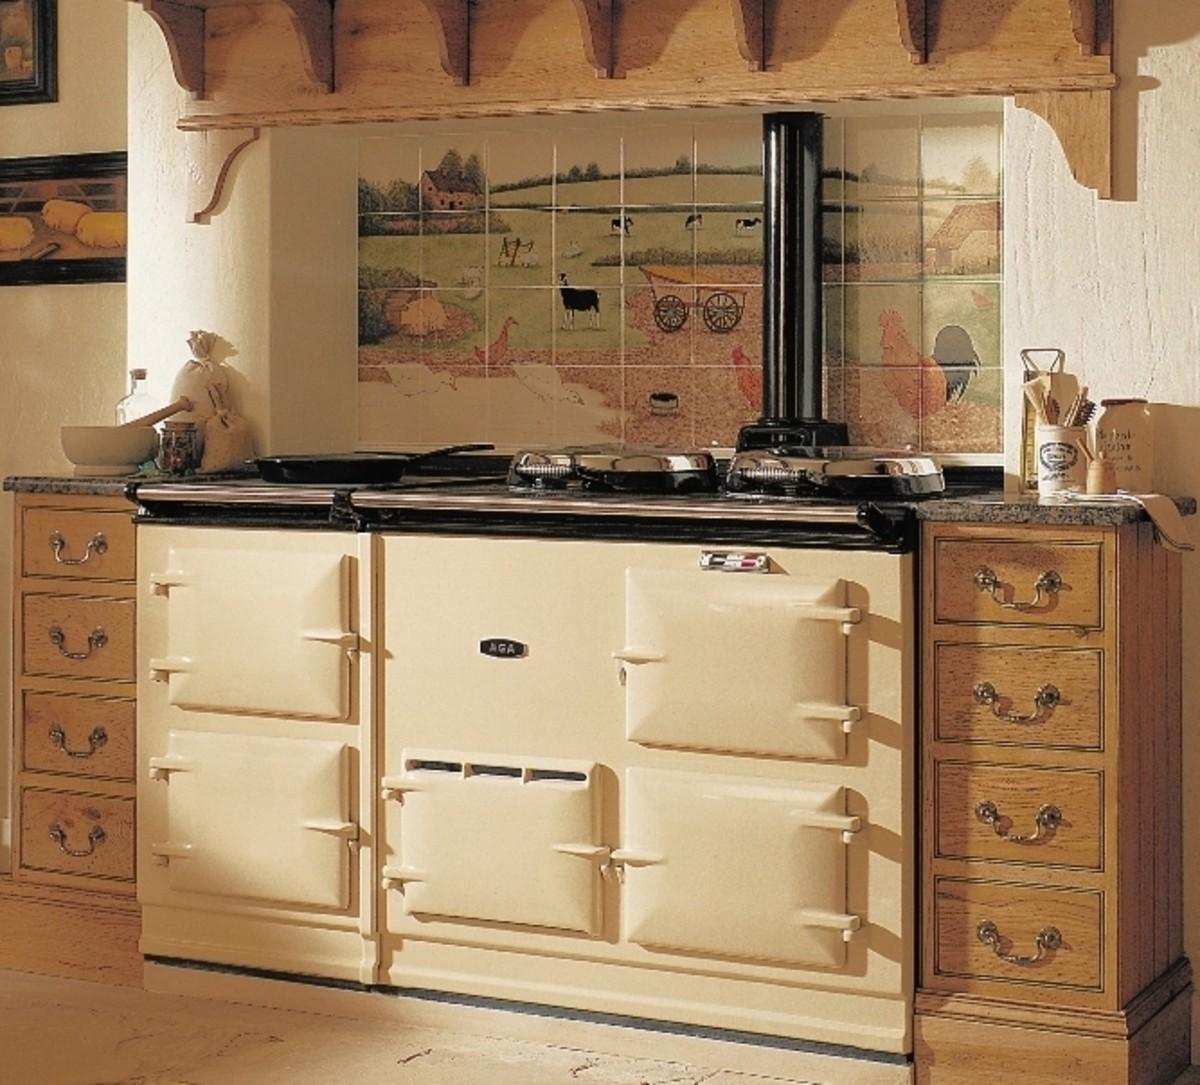 Aga 4 Oven Cooker